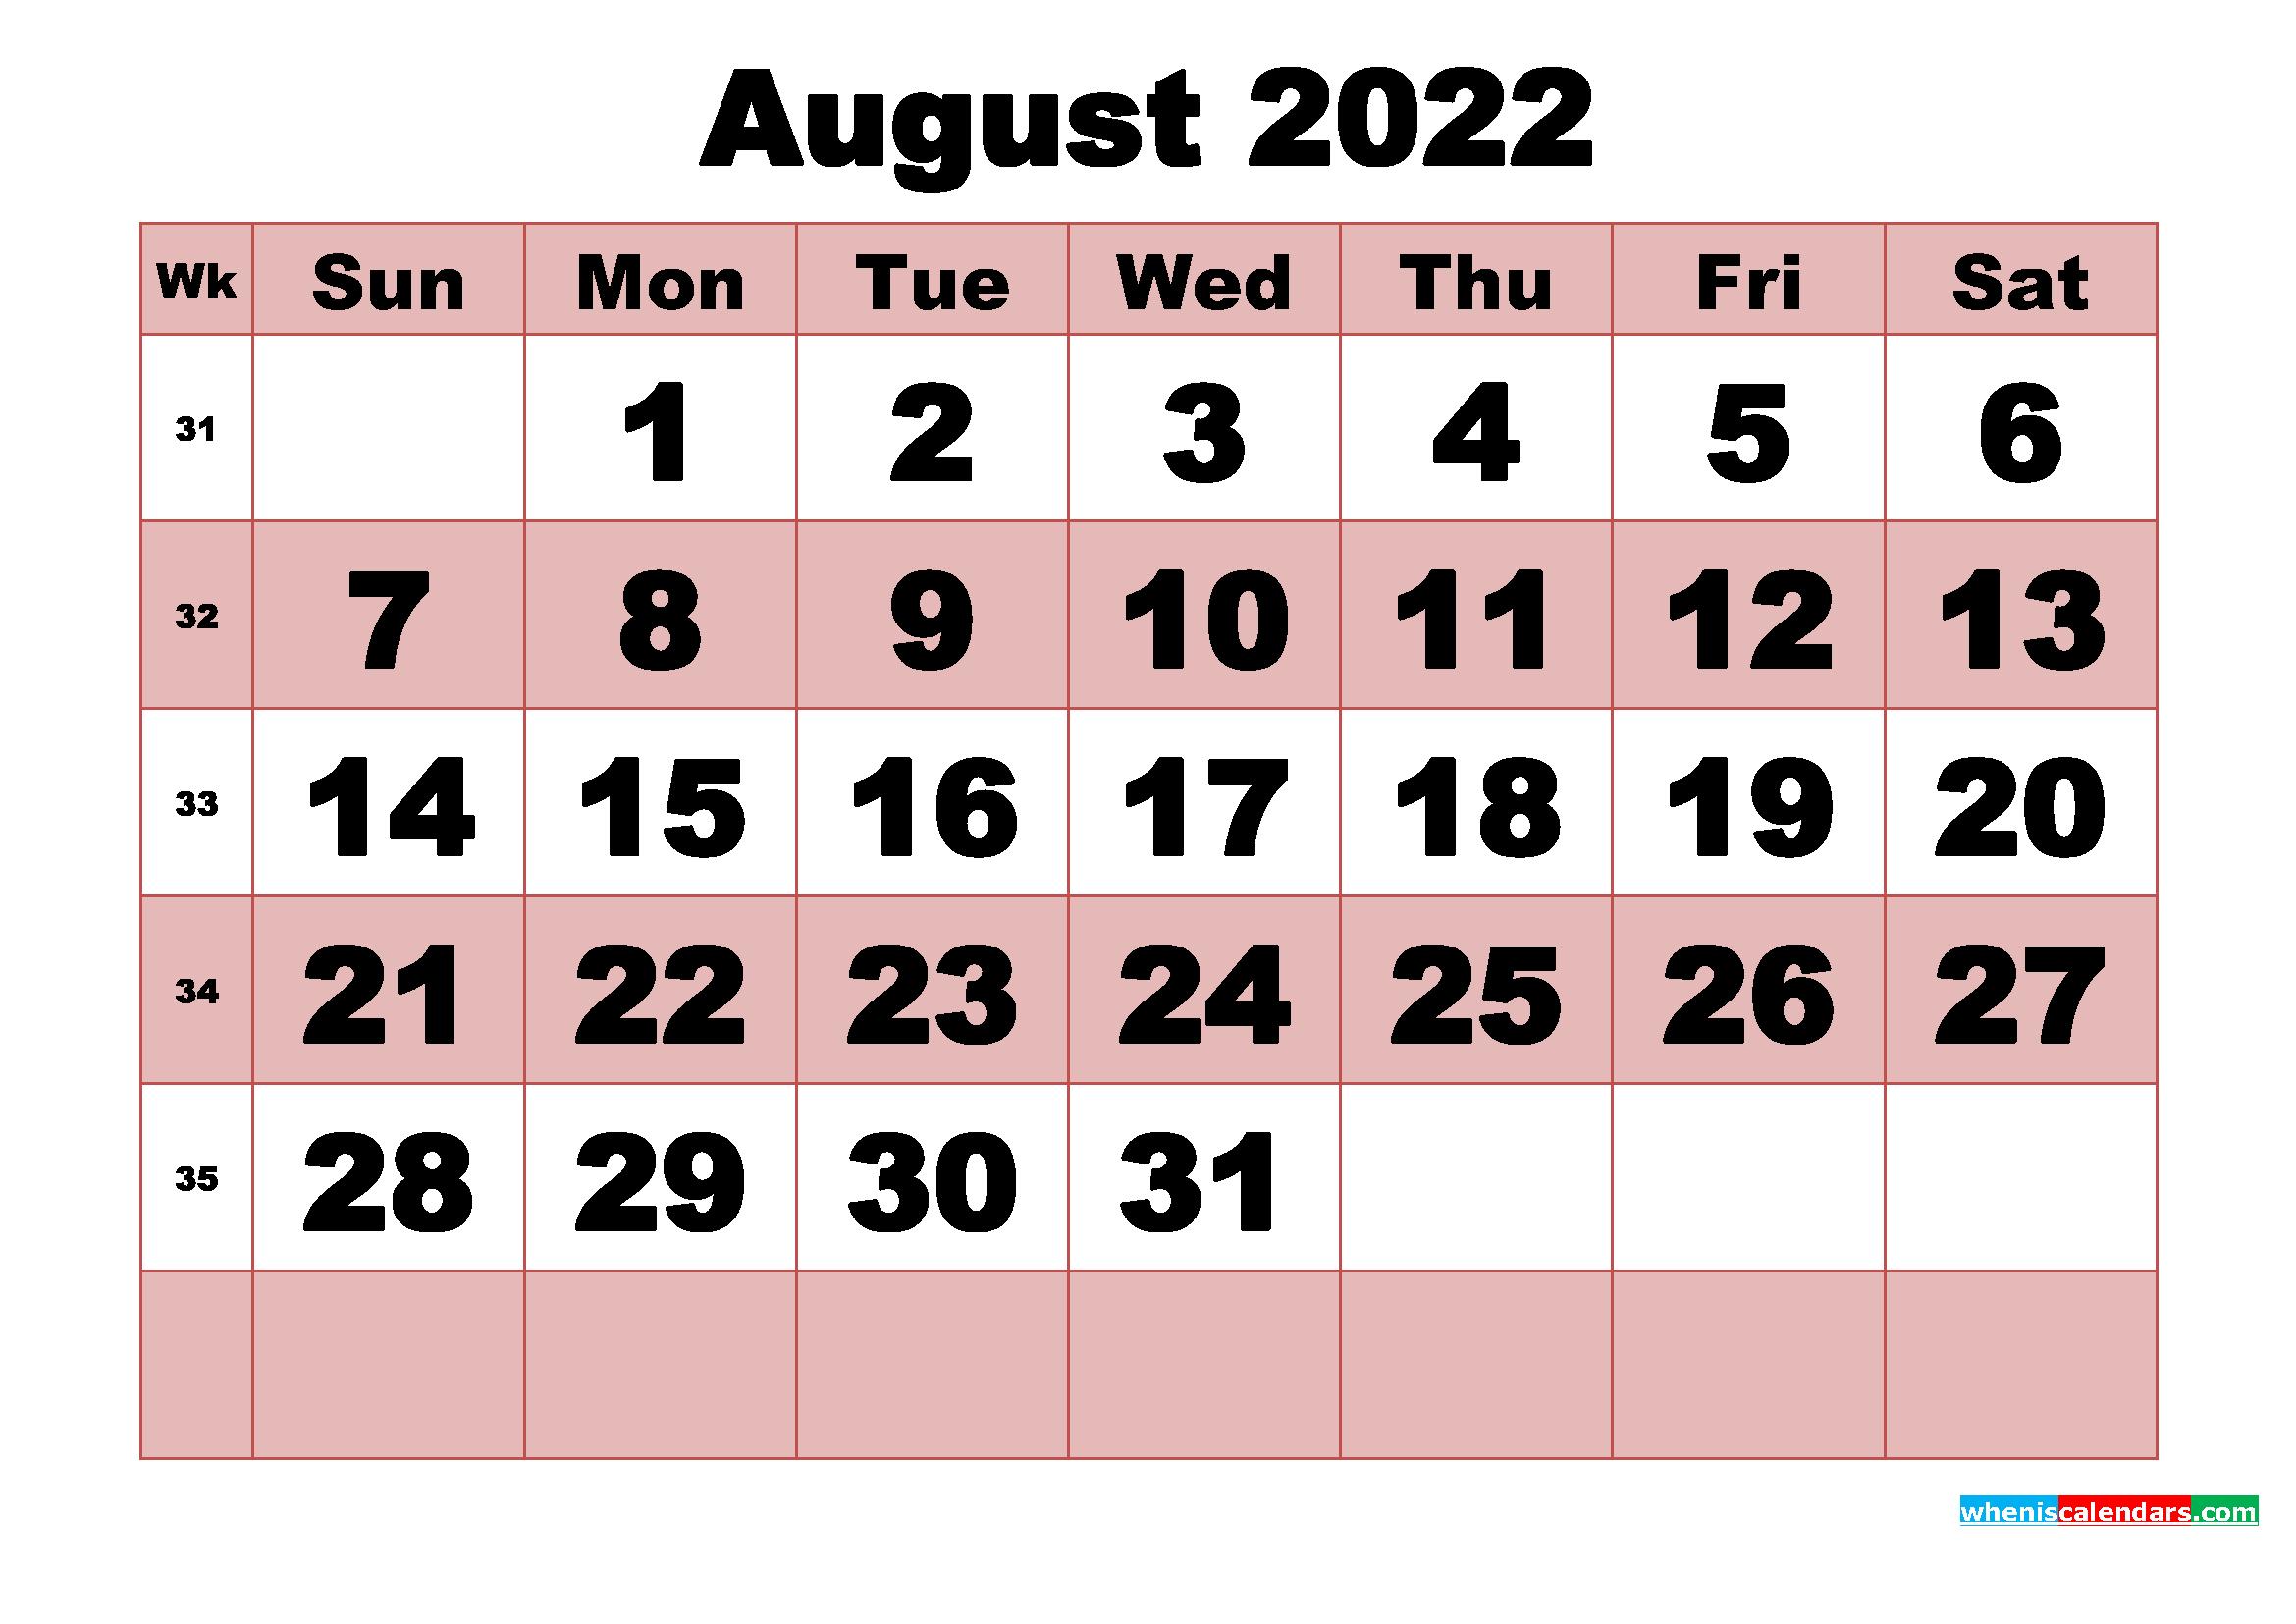 August 2022 Hindu Calendar